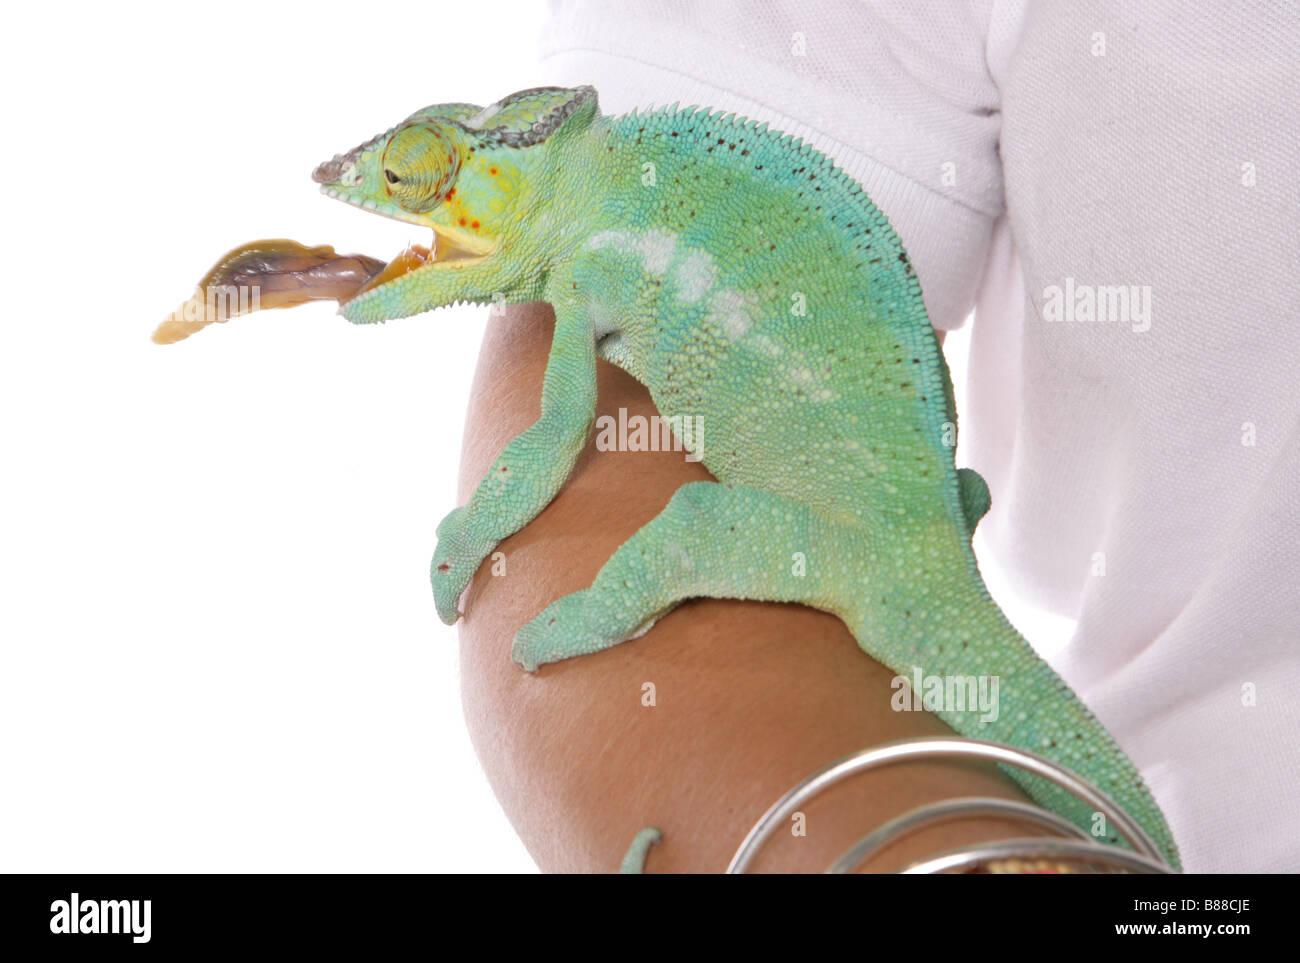 chameleon lizard studio portrait - Stock Image